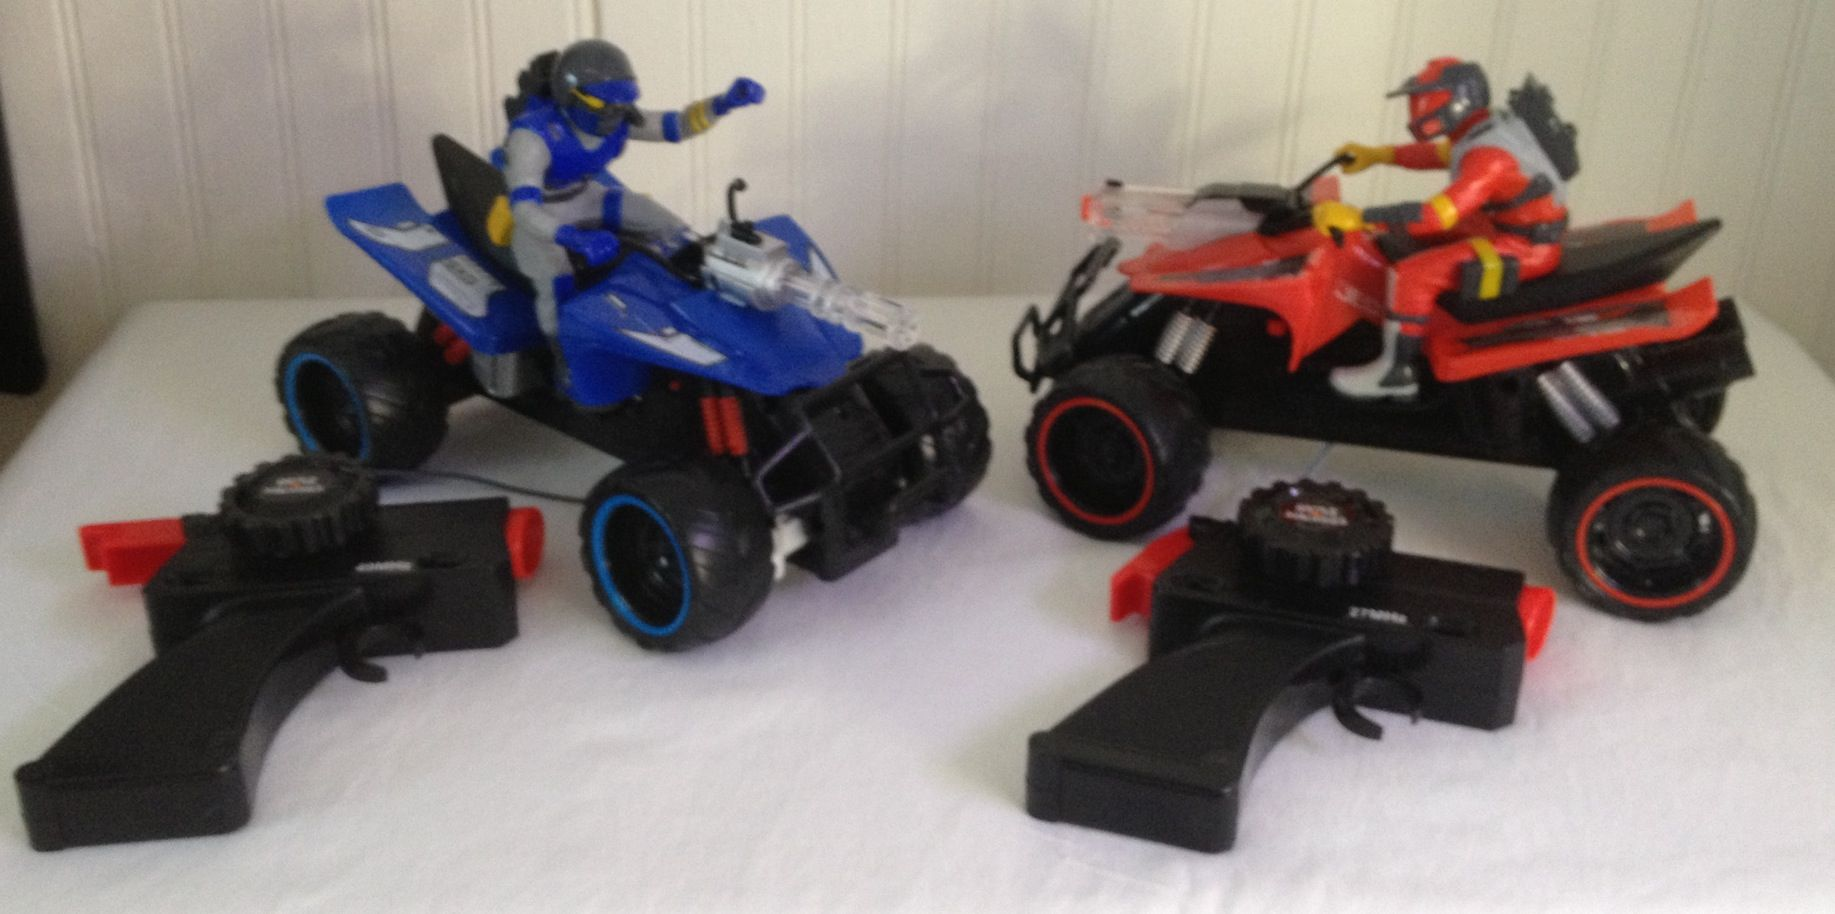 Jada car toys  Jada Toys Battle Machines RadioControlled Quad Bike Laser Combat